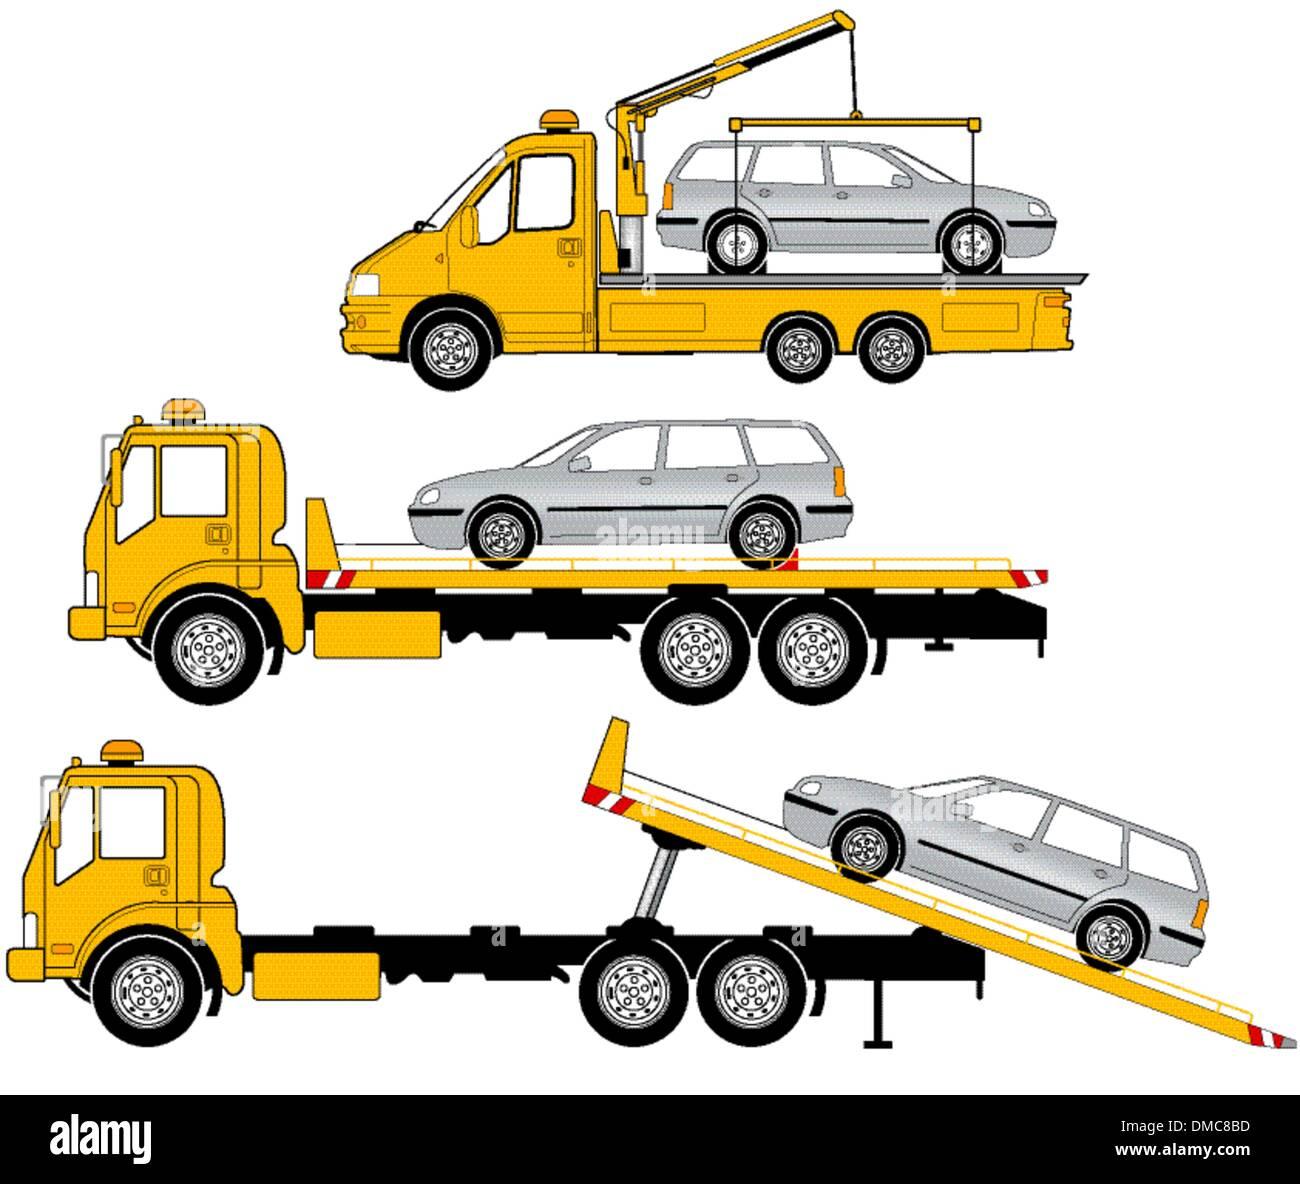 Carro de remolque Imagen De Stock